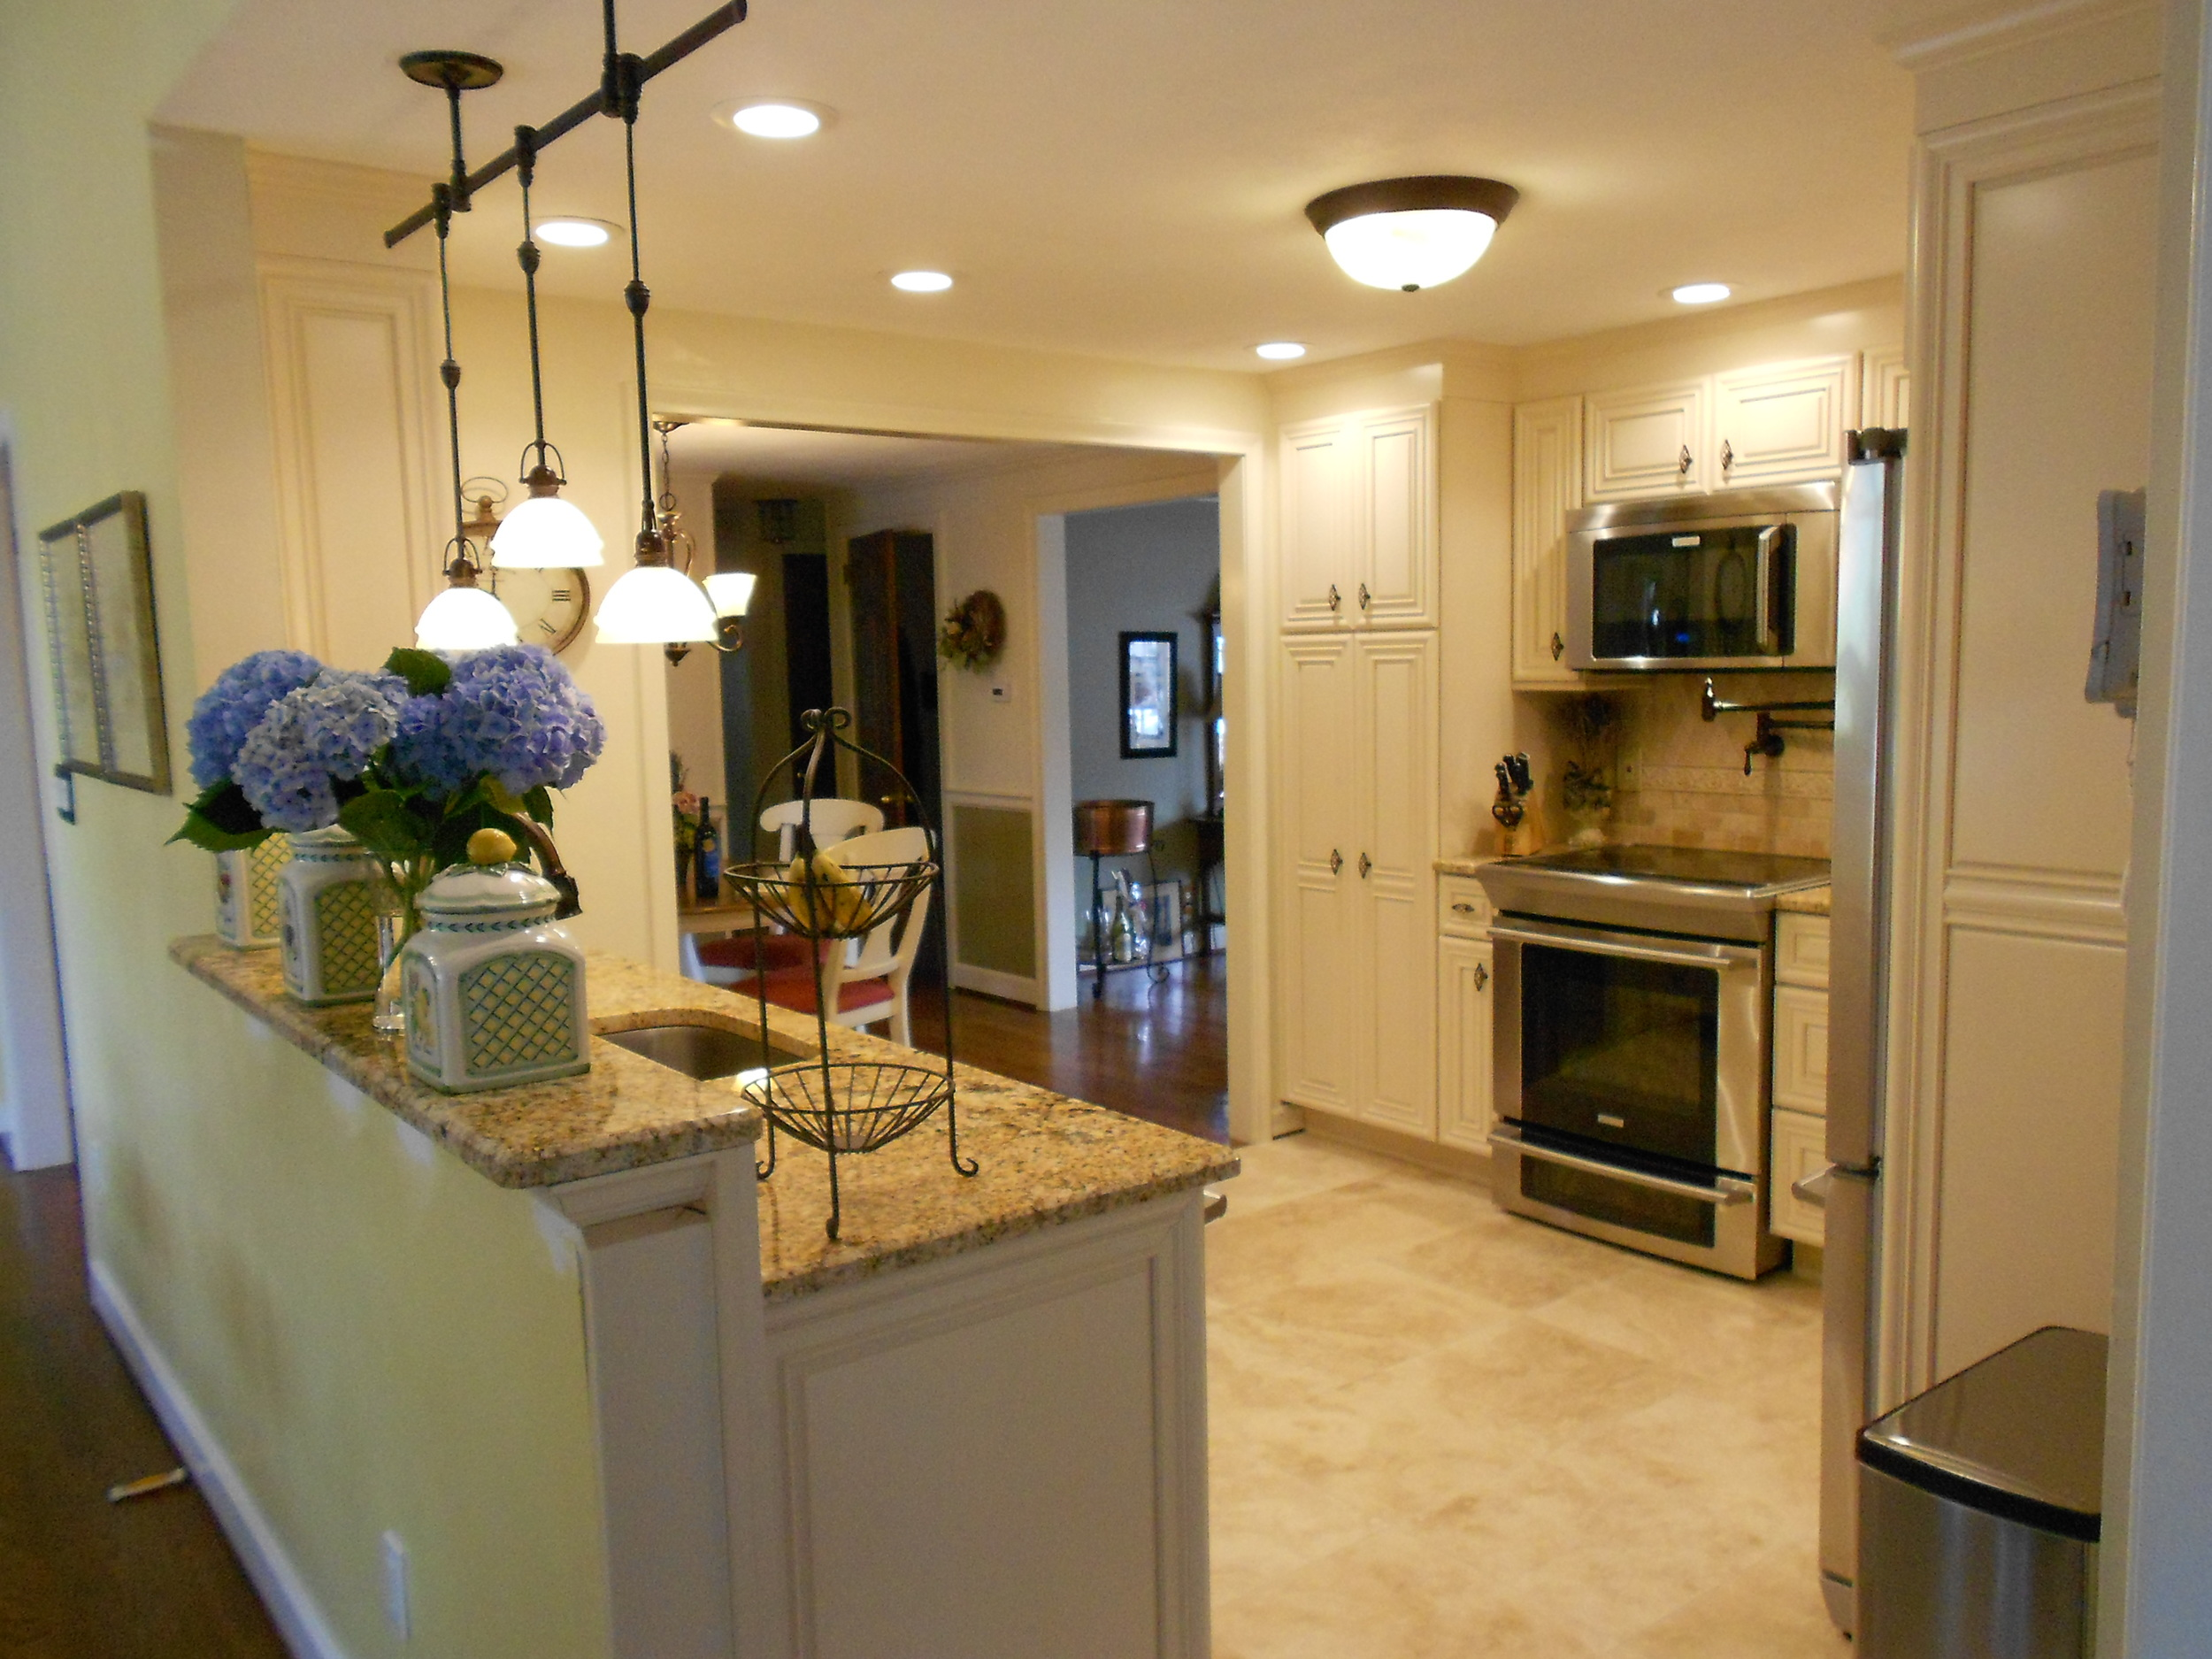 kitchen-remodel-19.jpg